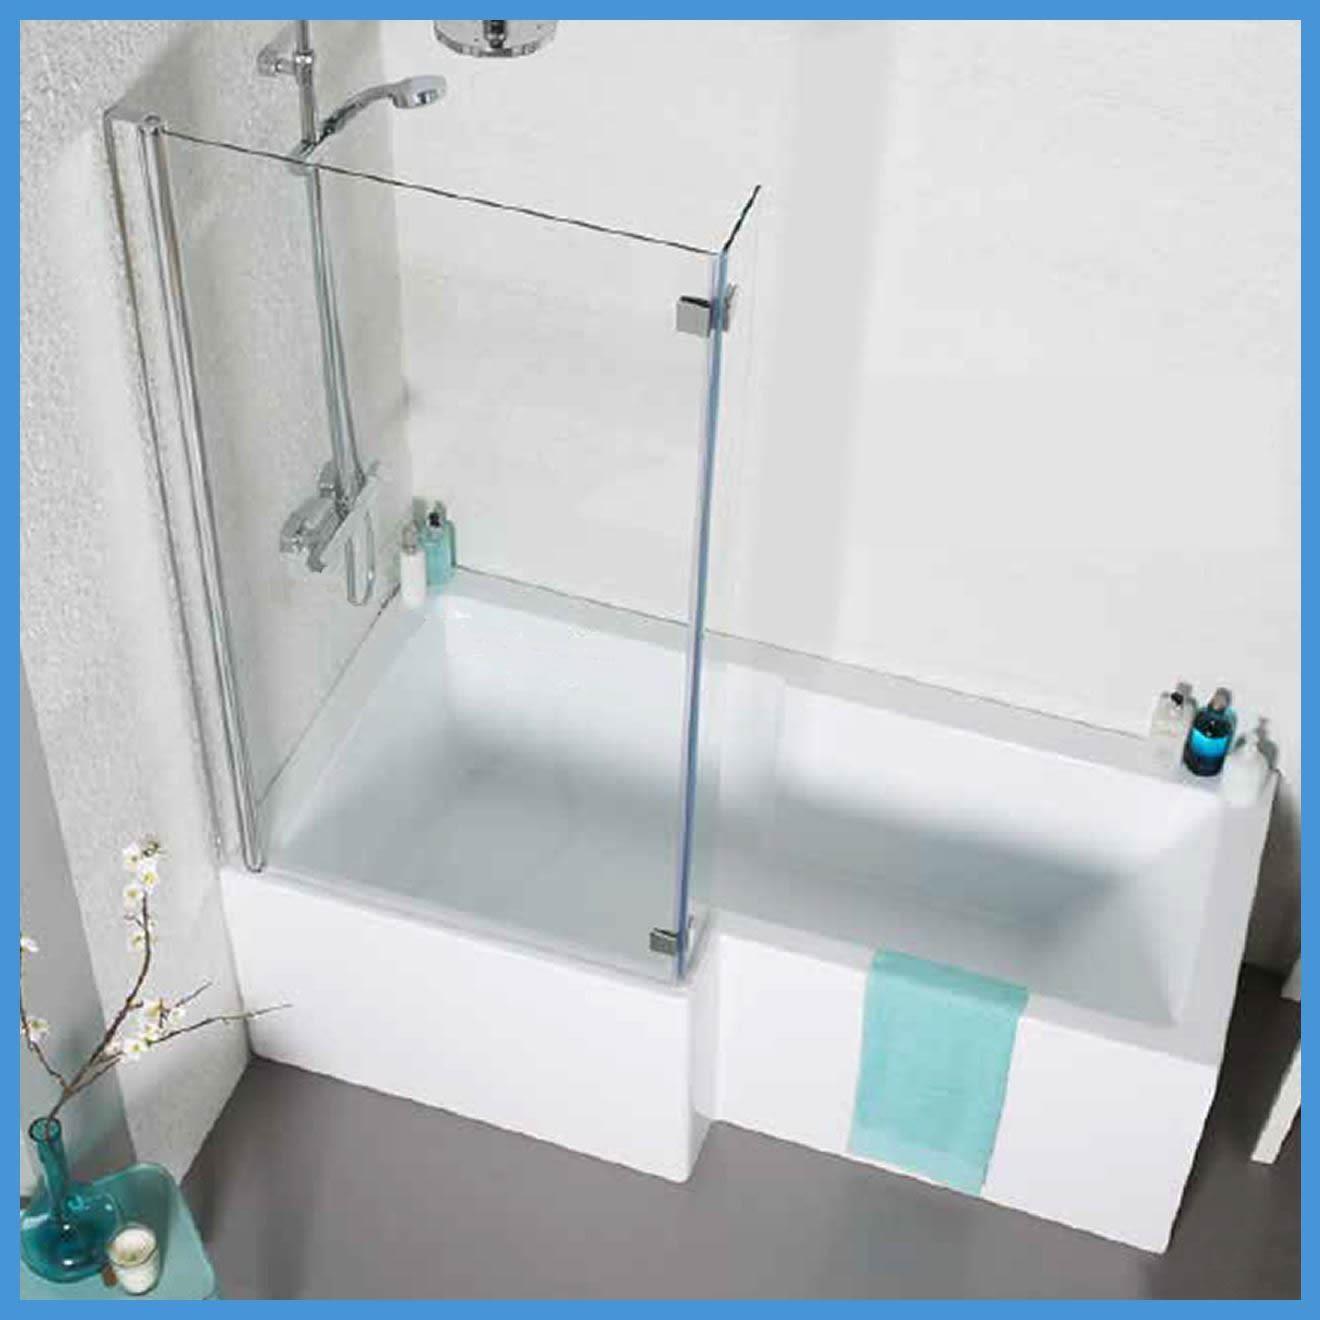 Bathroom Suites Ebay L Shaped Bathroom Suite 1700 Bath 550 Vanity Unit Btw Toilet Wc